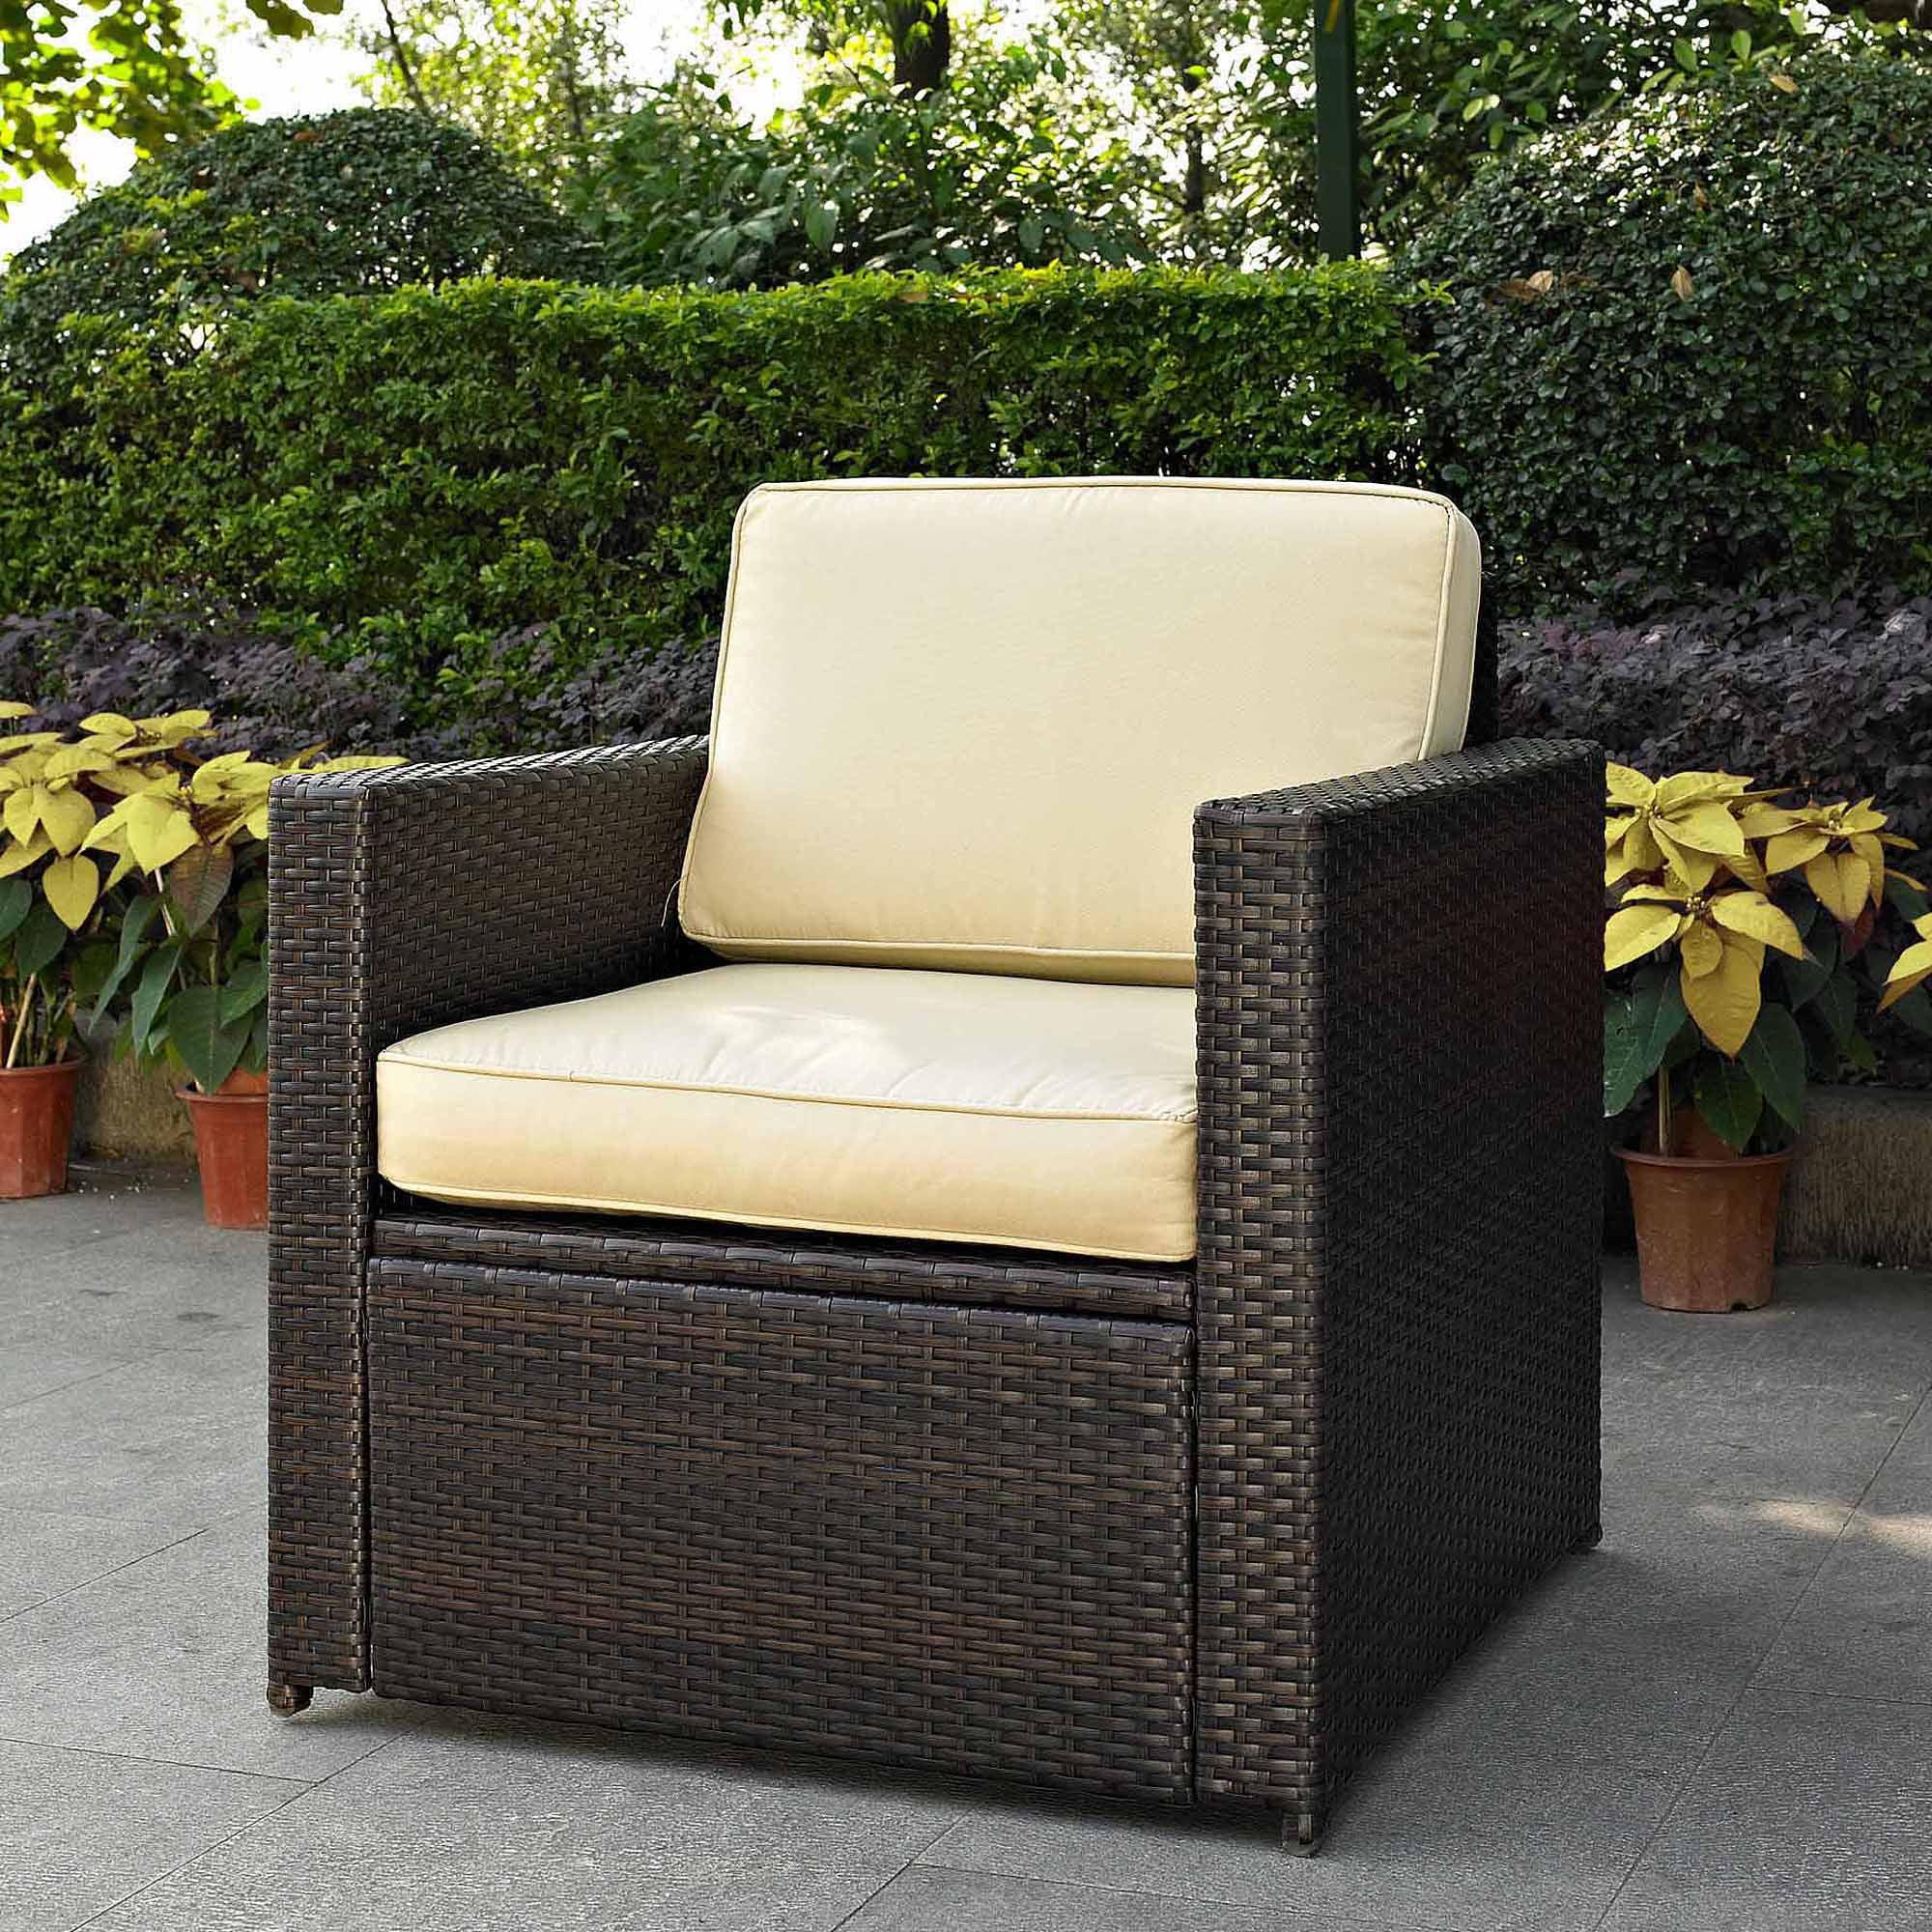 wicker chair for sale office vs gaming reddit patio sense deluxe coconino walmart com